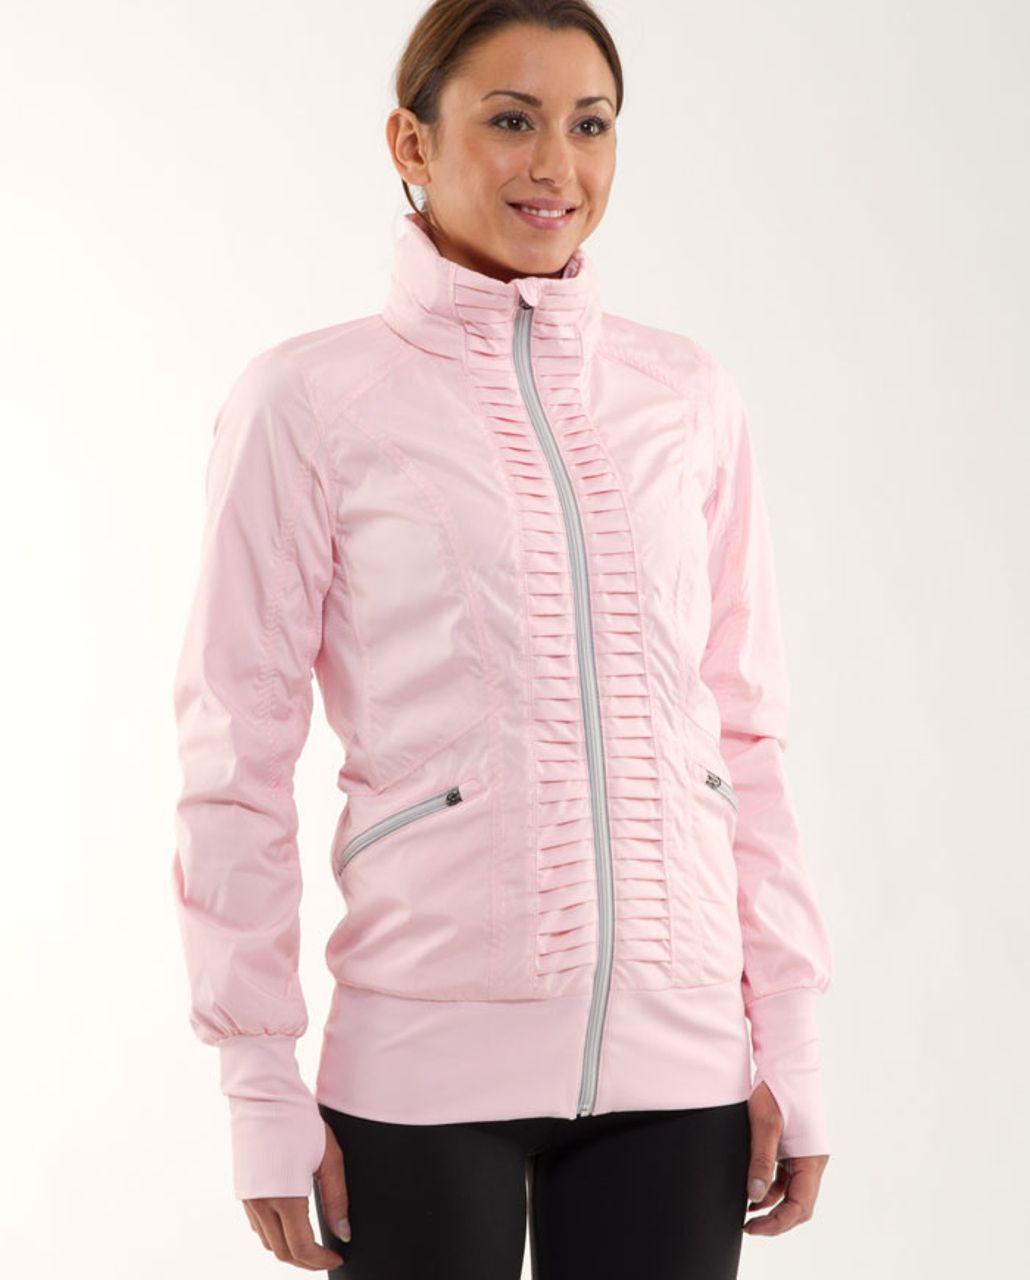 Lululemon Run:  Back On Track Jacket - Pig Pink